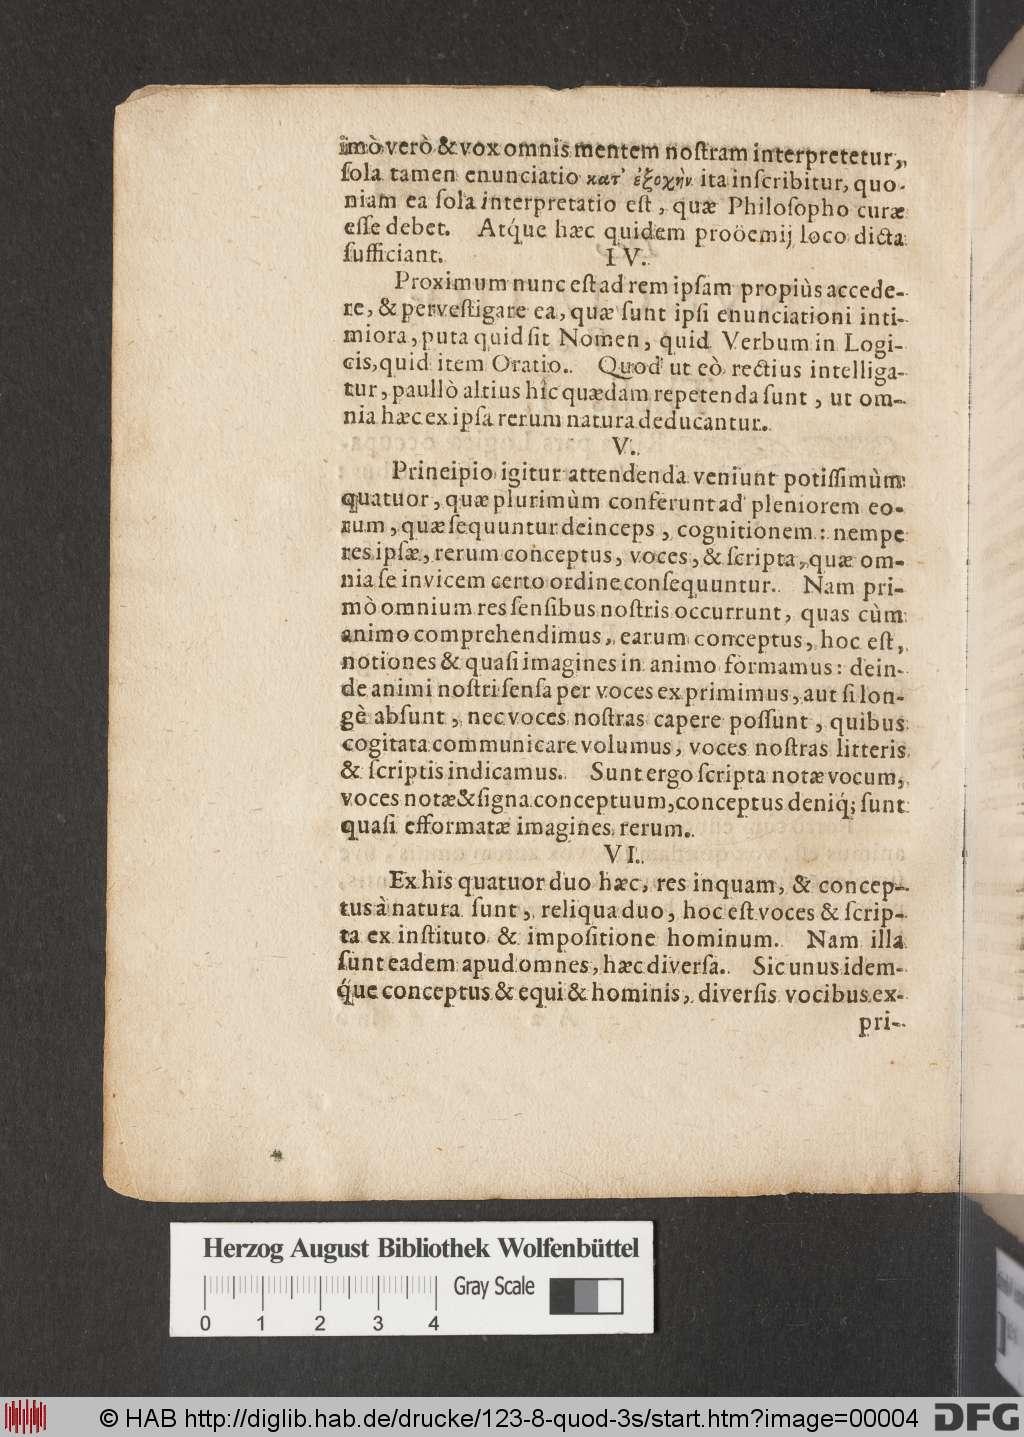 http://diglib.hab.de/drucke/123-8-quod-3s/00004.jpg